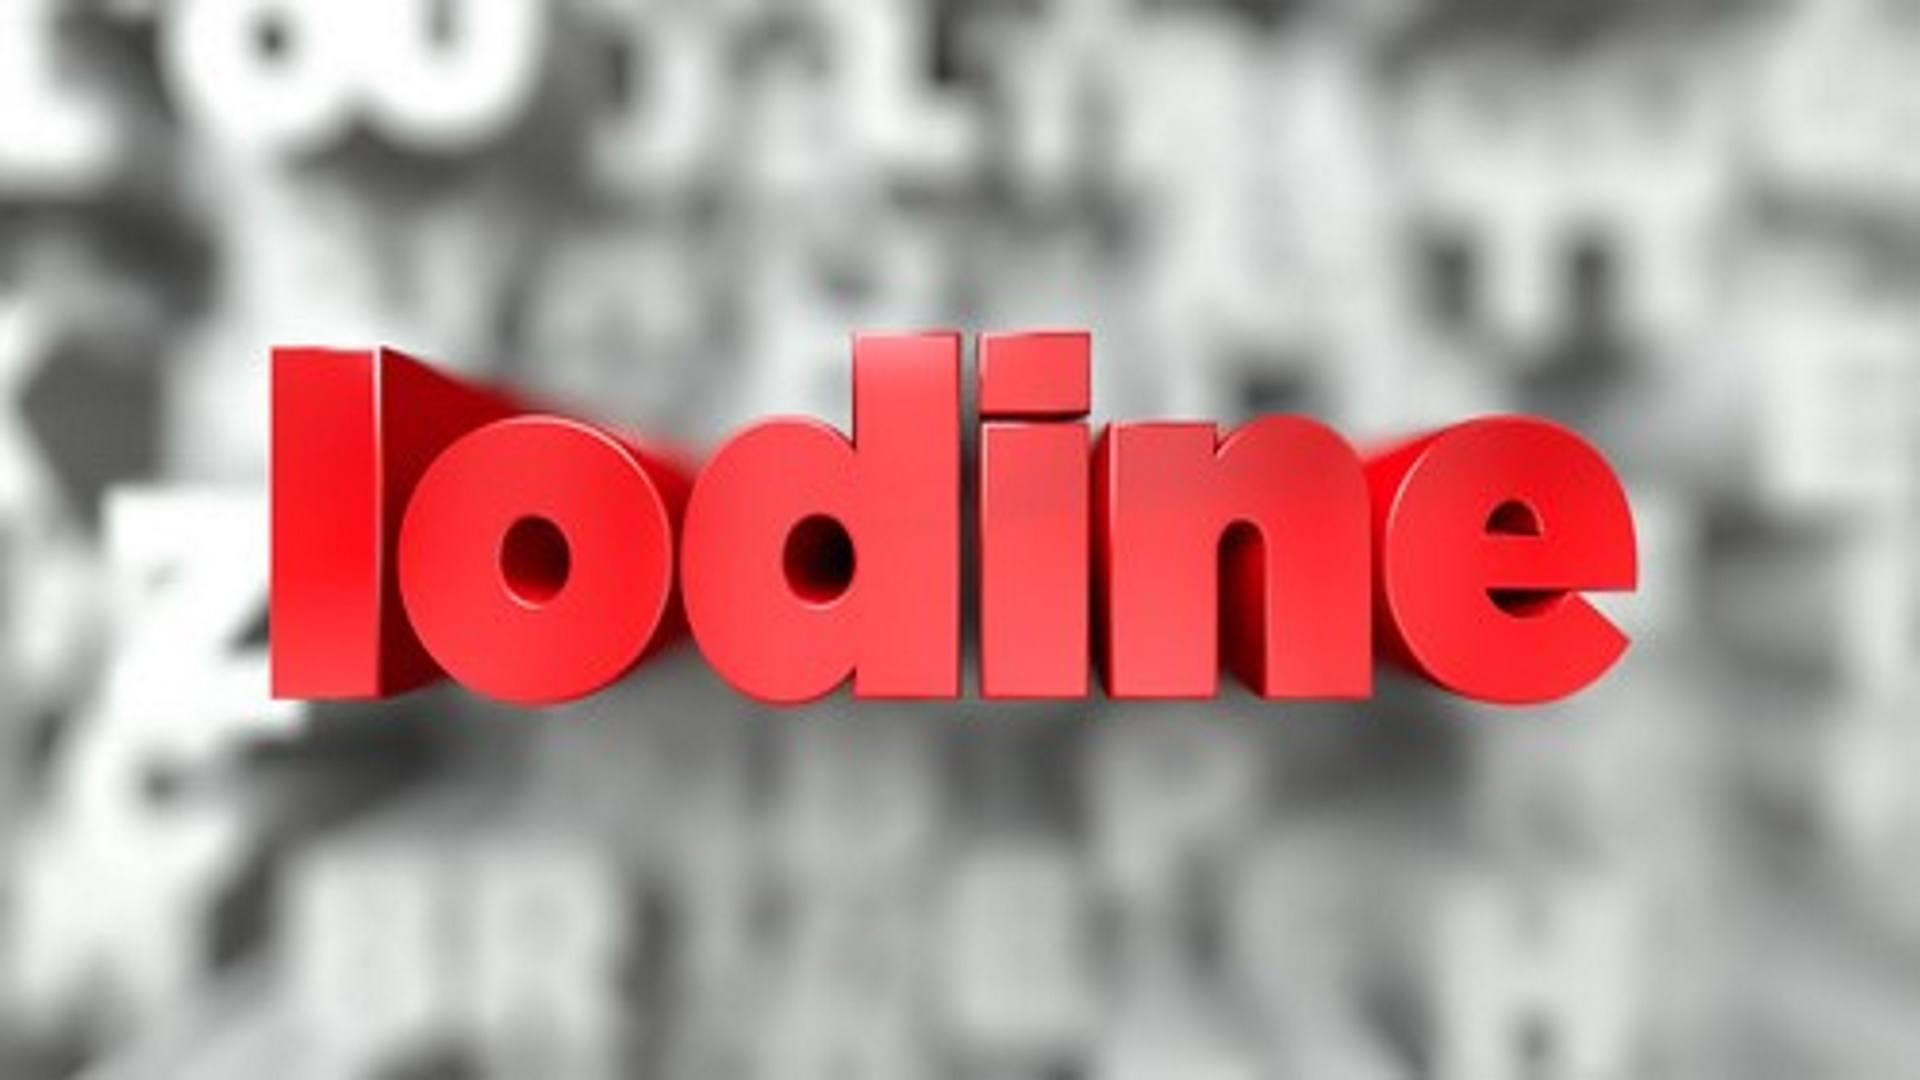 Iodine Awareness Week – Antimicrobial Resistance Emergency